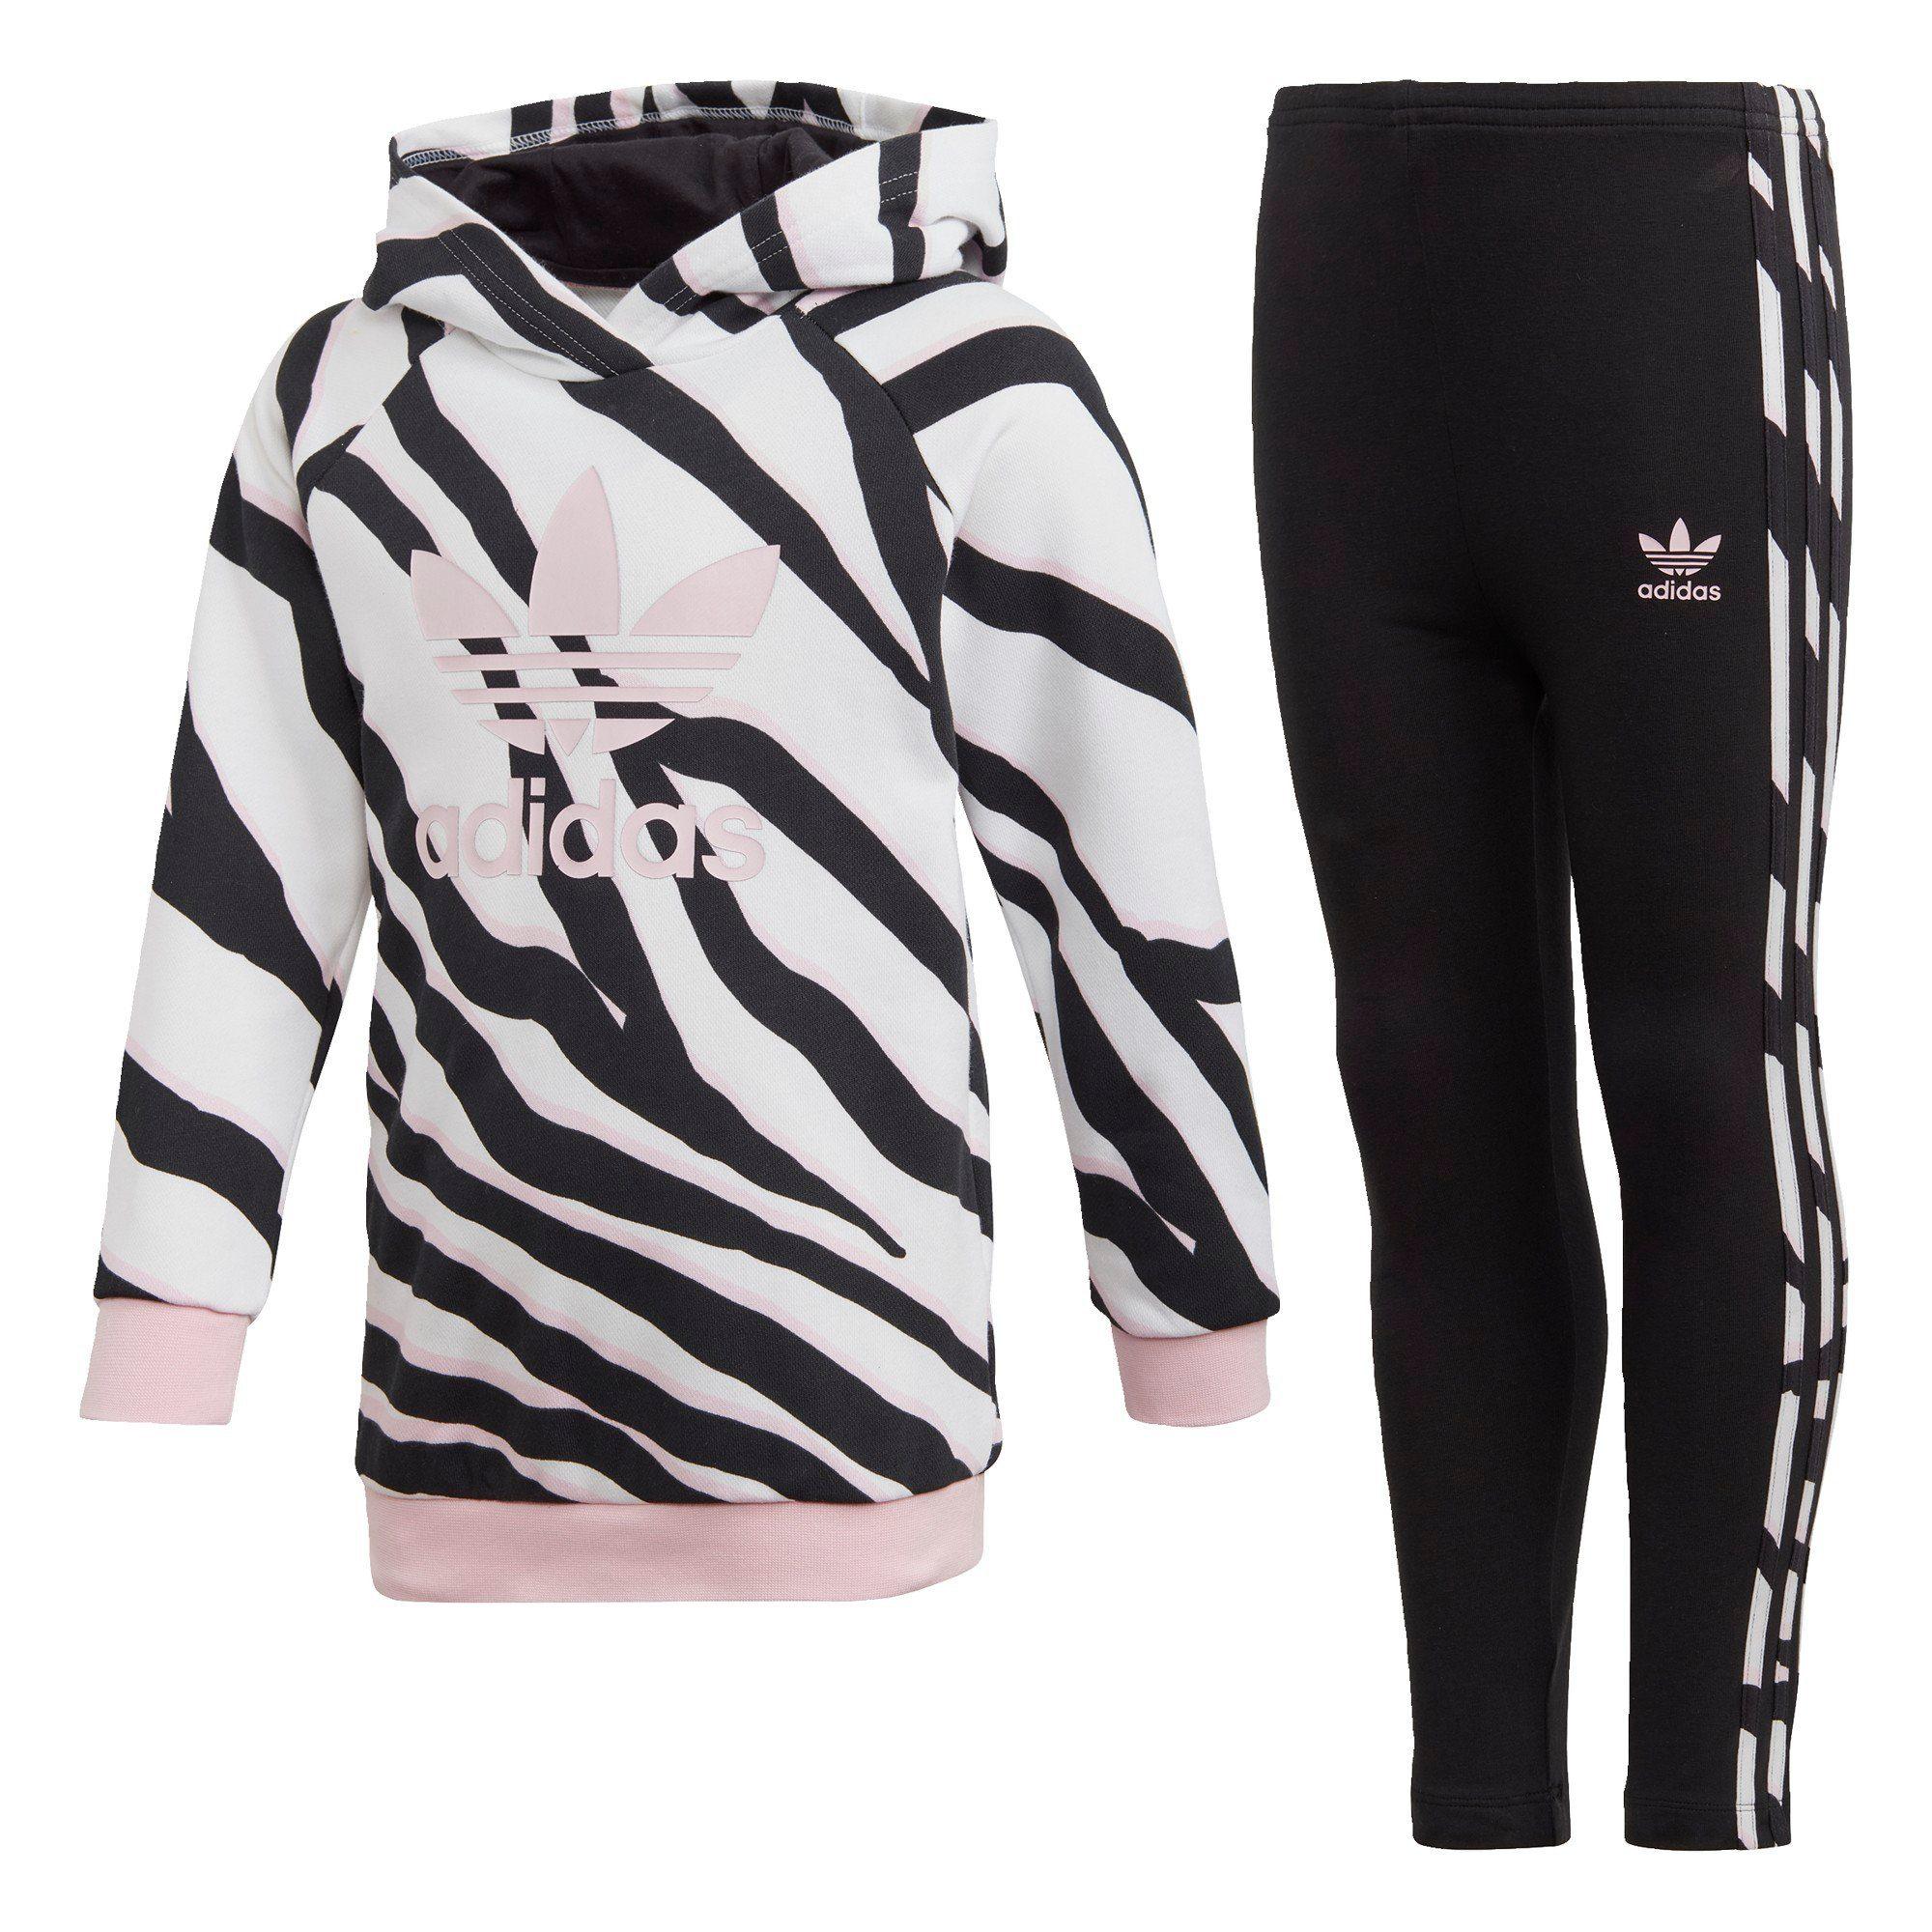 adidas Originals Trainingsanzug »LZ Hoodie Set«, AOP PACK online kaufen | OTTO